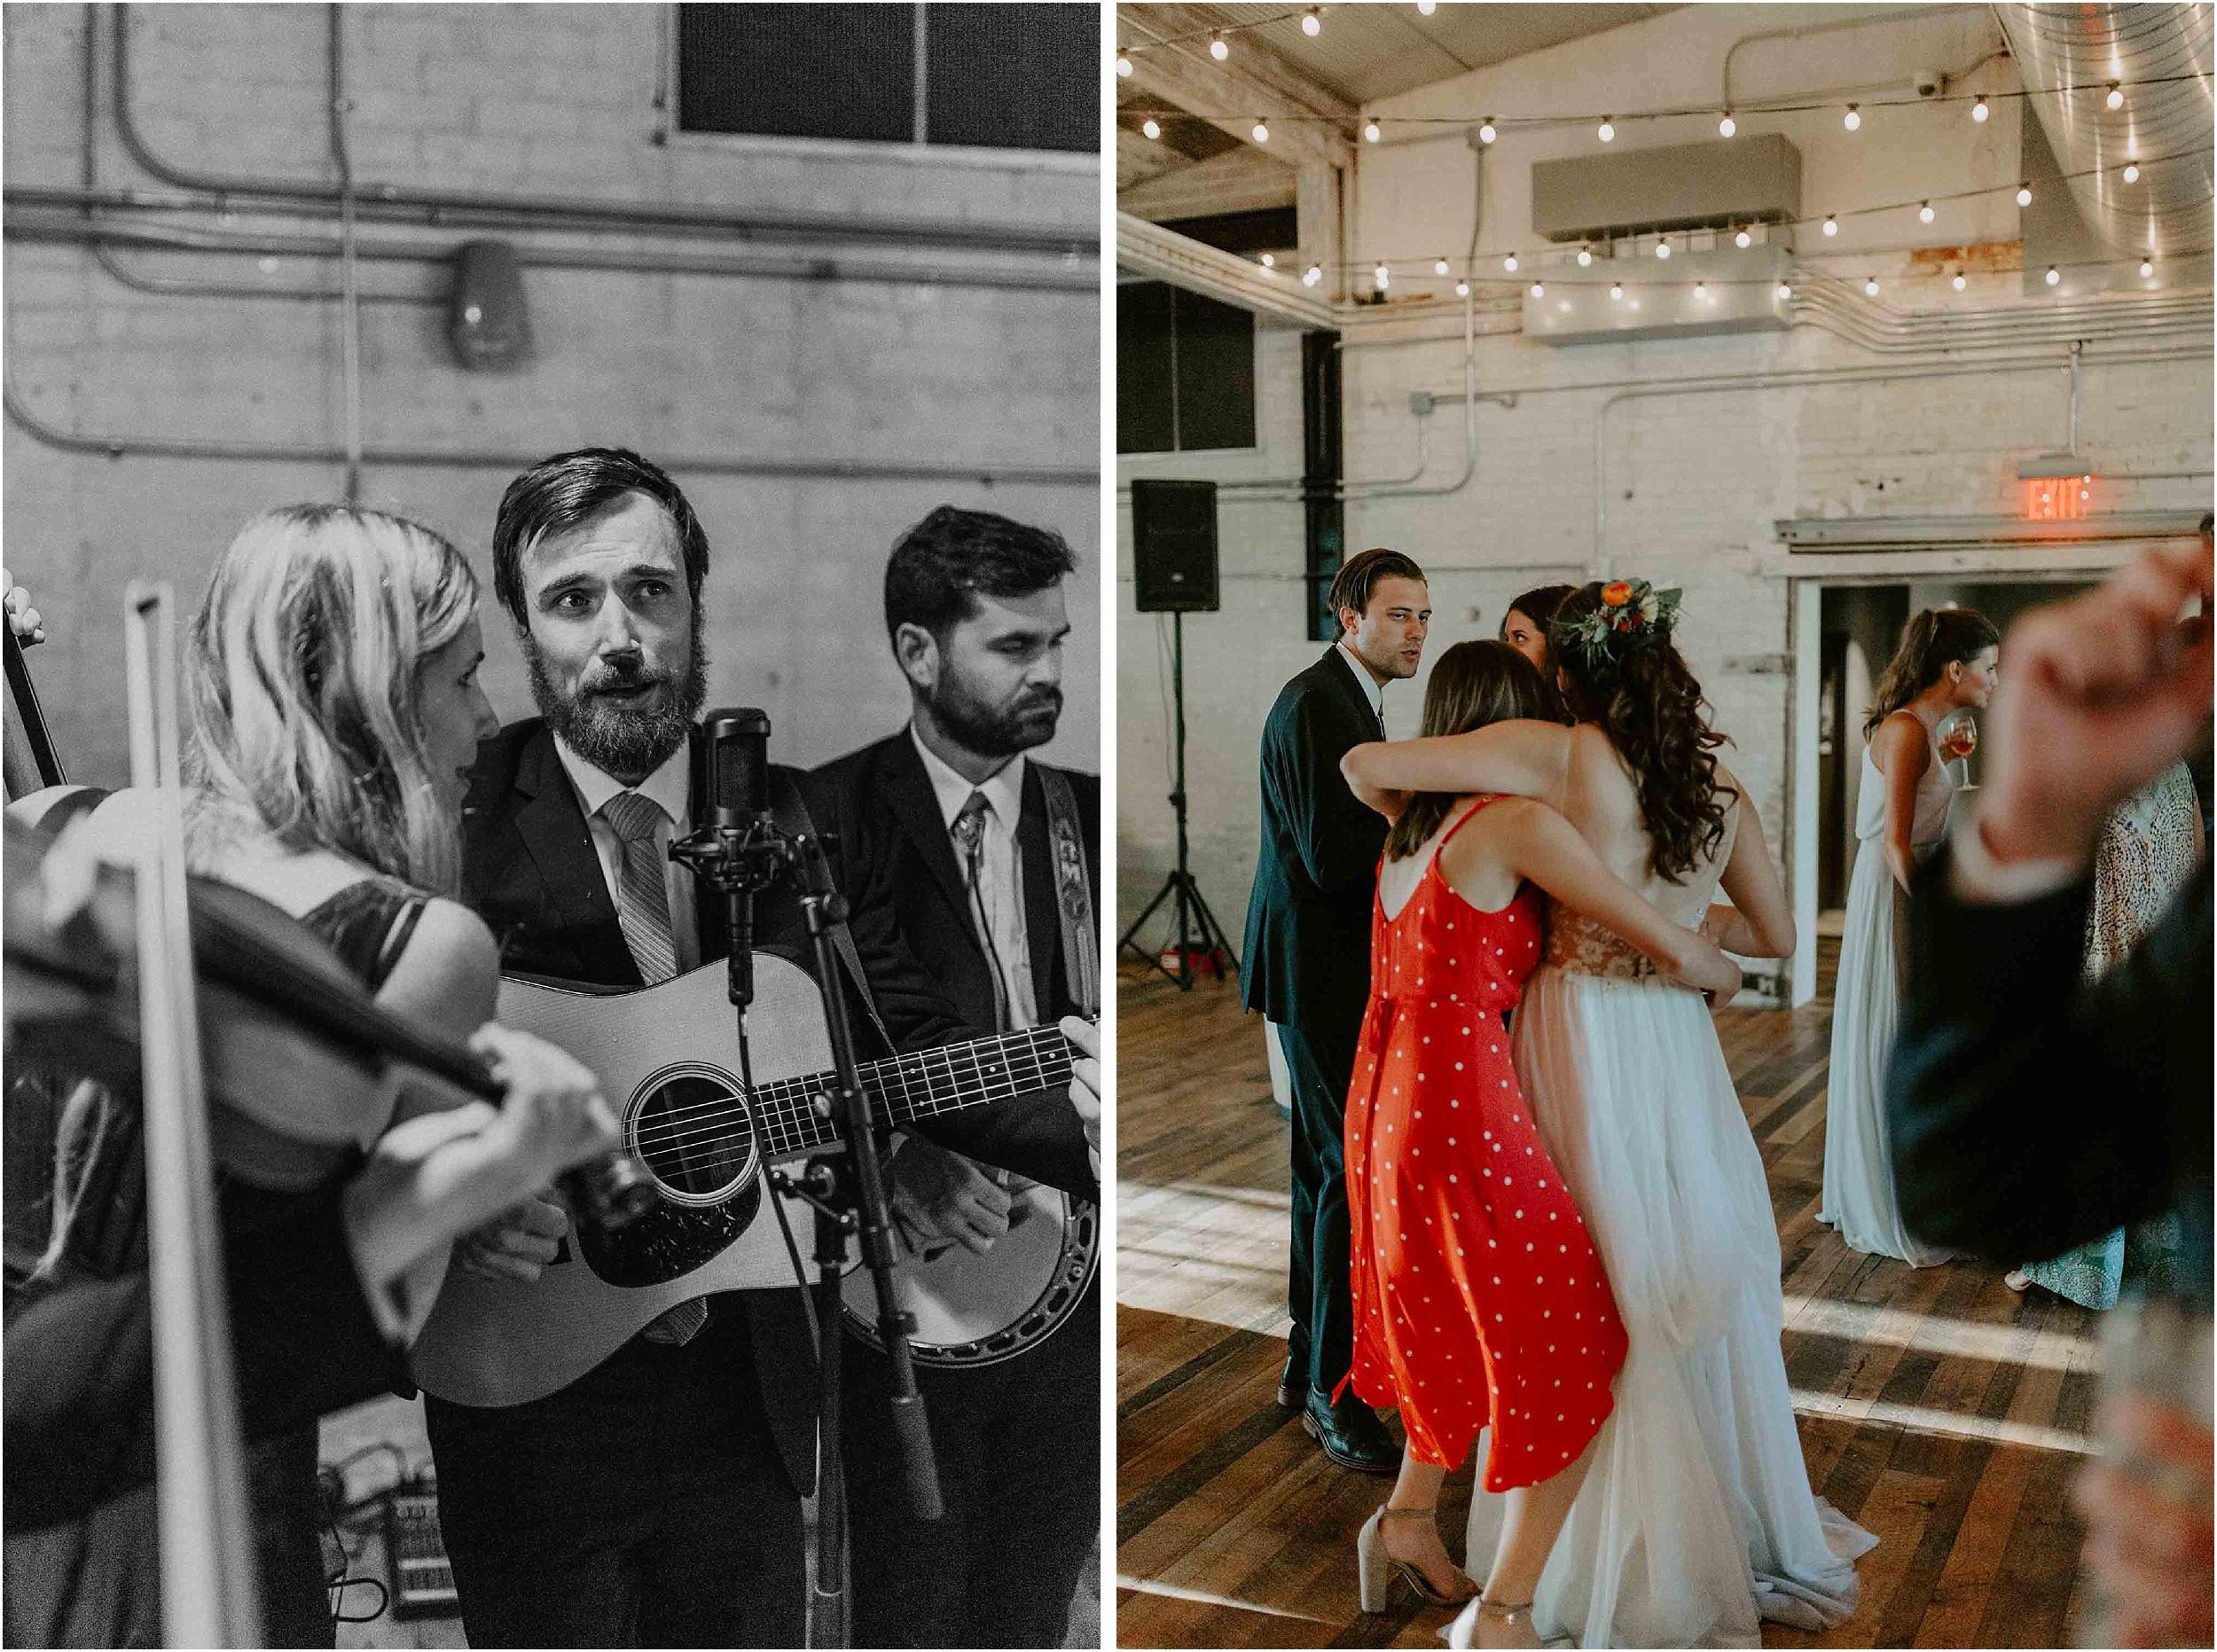 journeyman_distillery_wedding_photographer_chicago_il_wright_photographs-4780.jpg